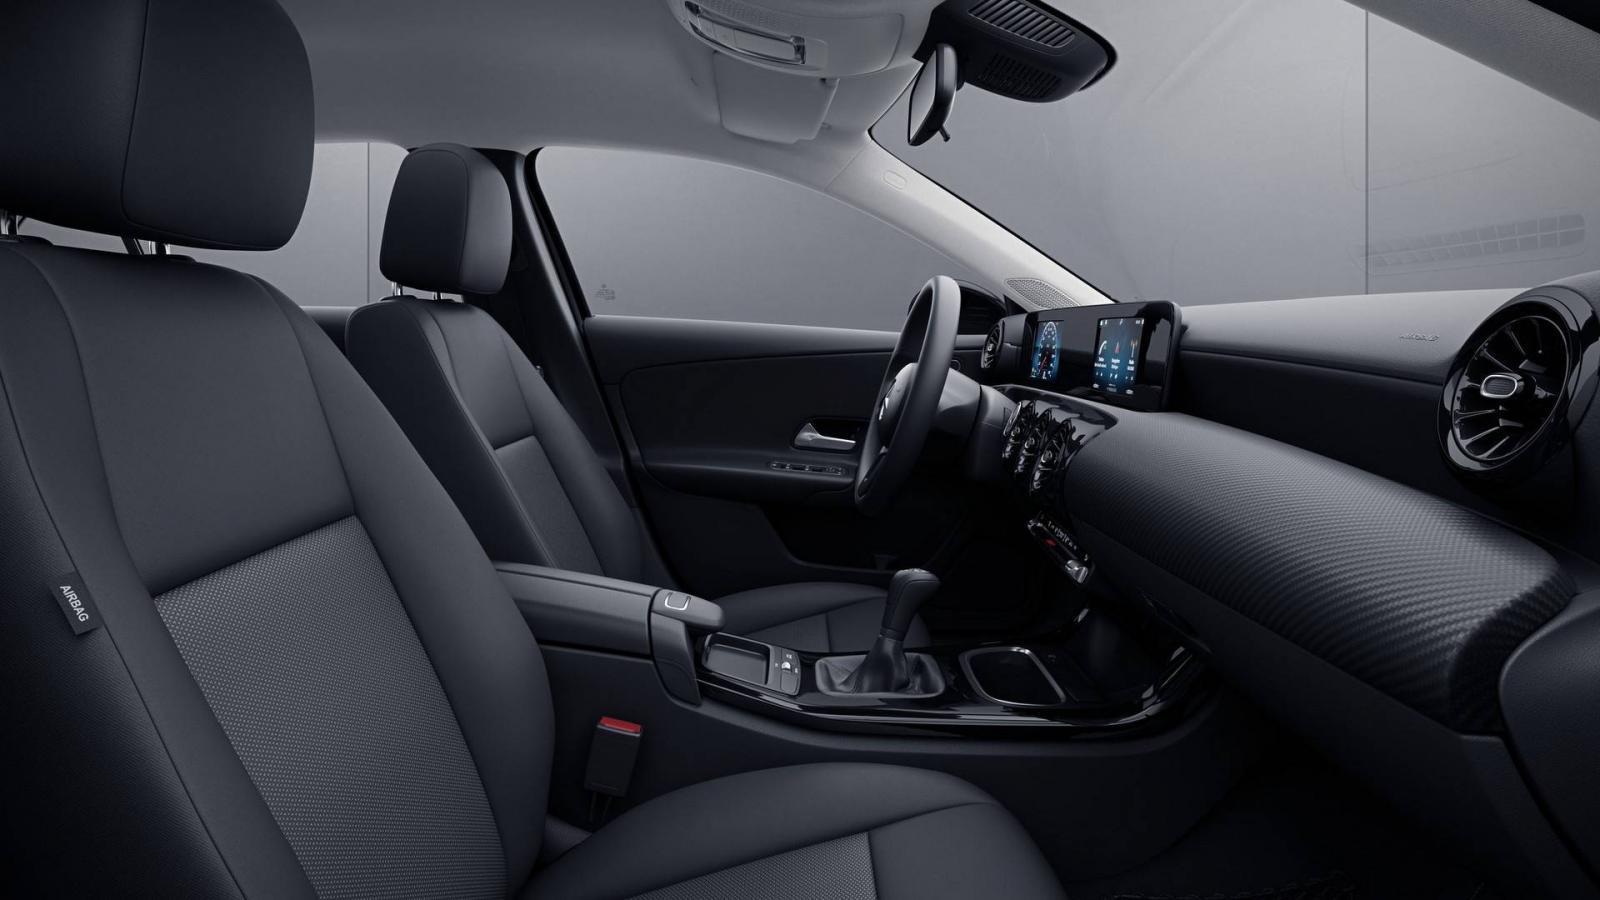 Компания Мерседес-Бенс объявила оприёме предзаказов нановый хэтчбек A-Class